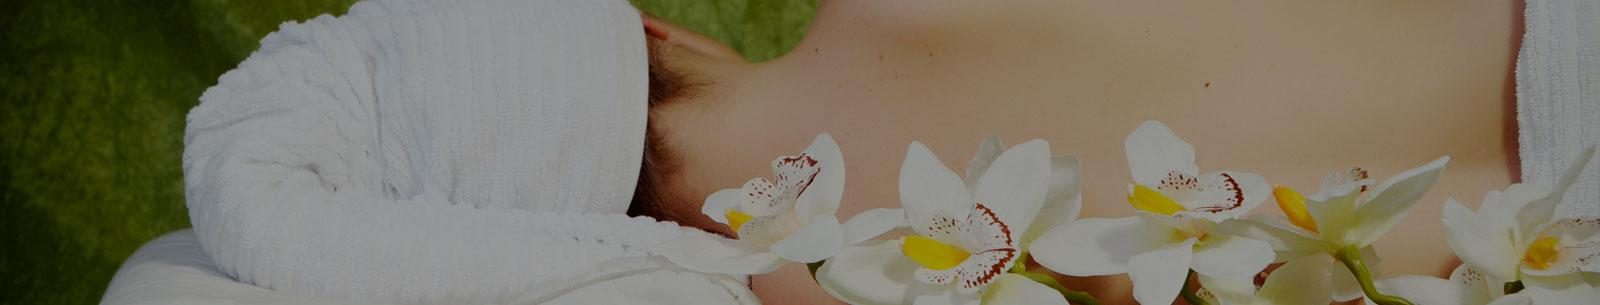 Beauty Treatments Derry Header